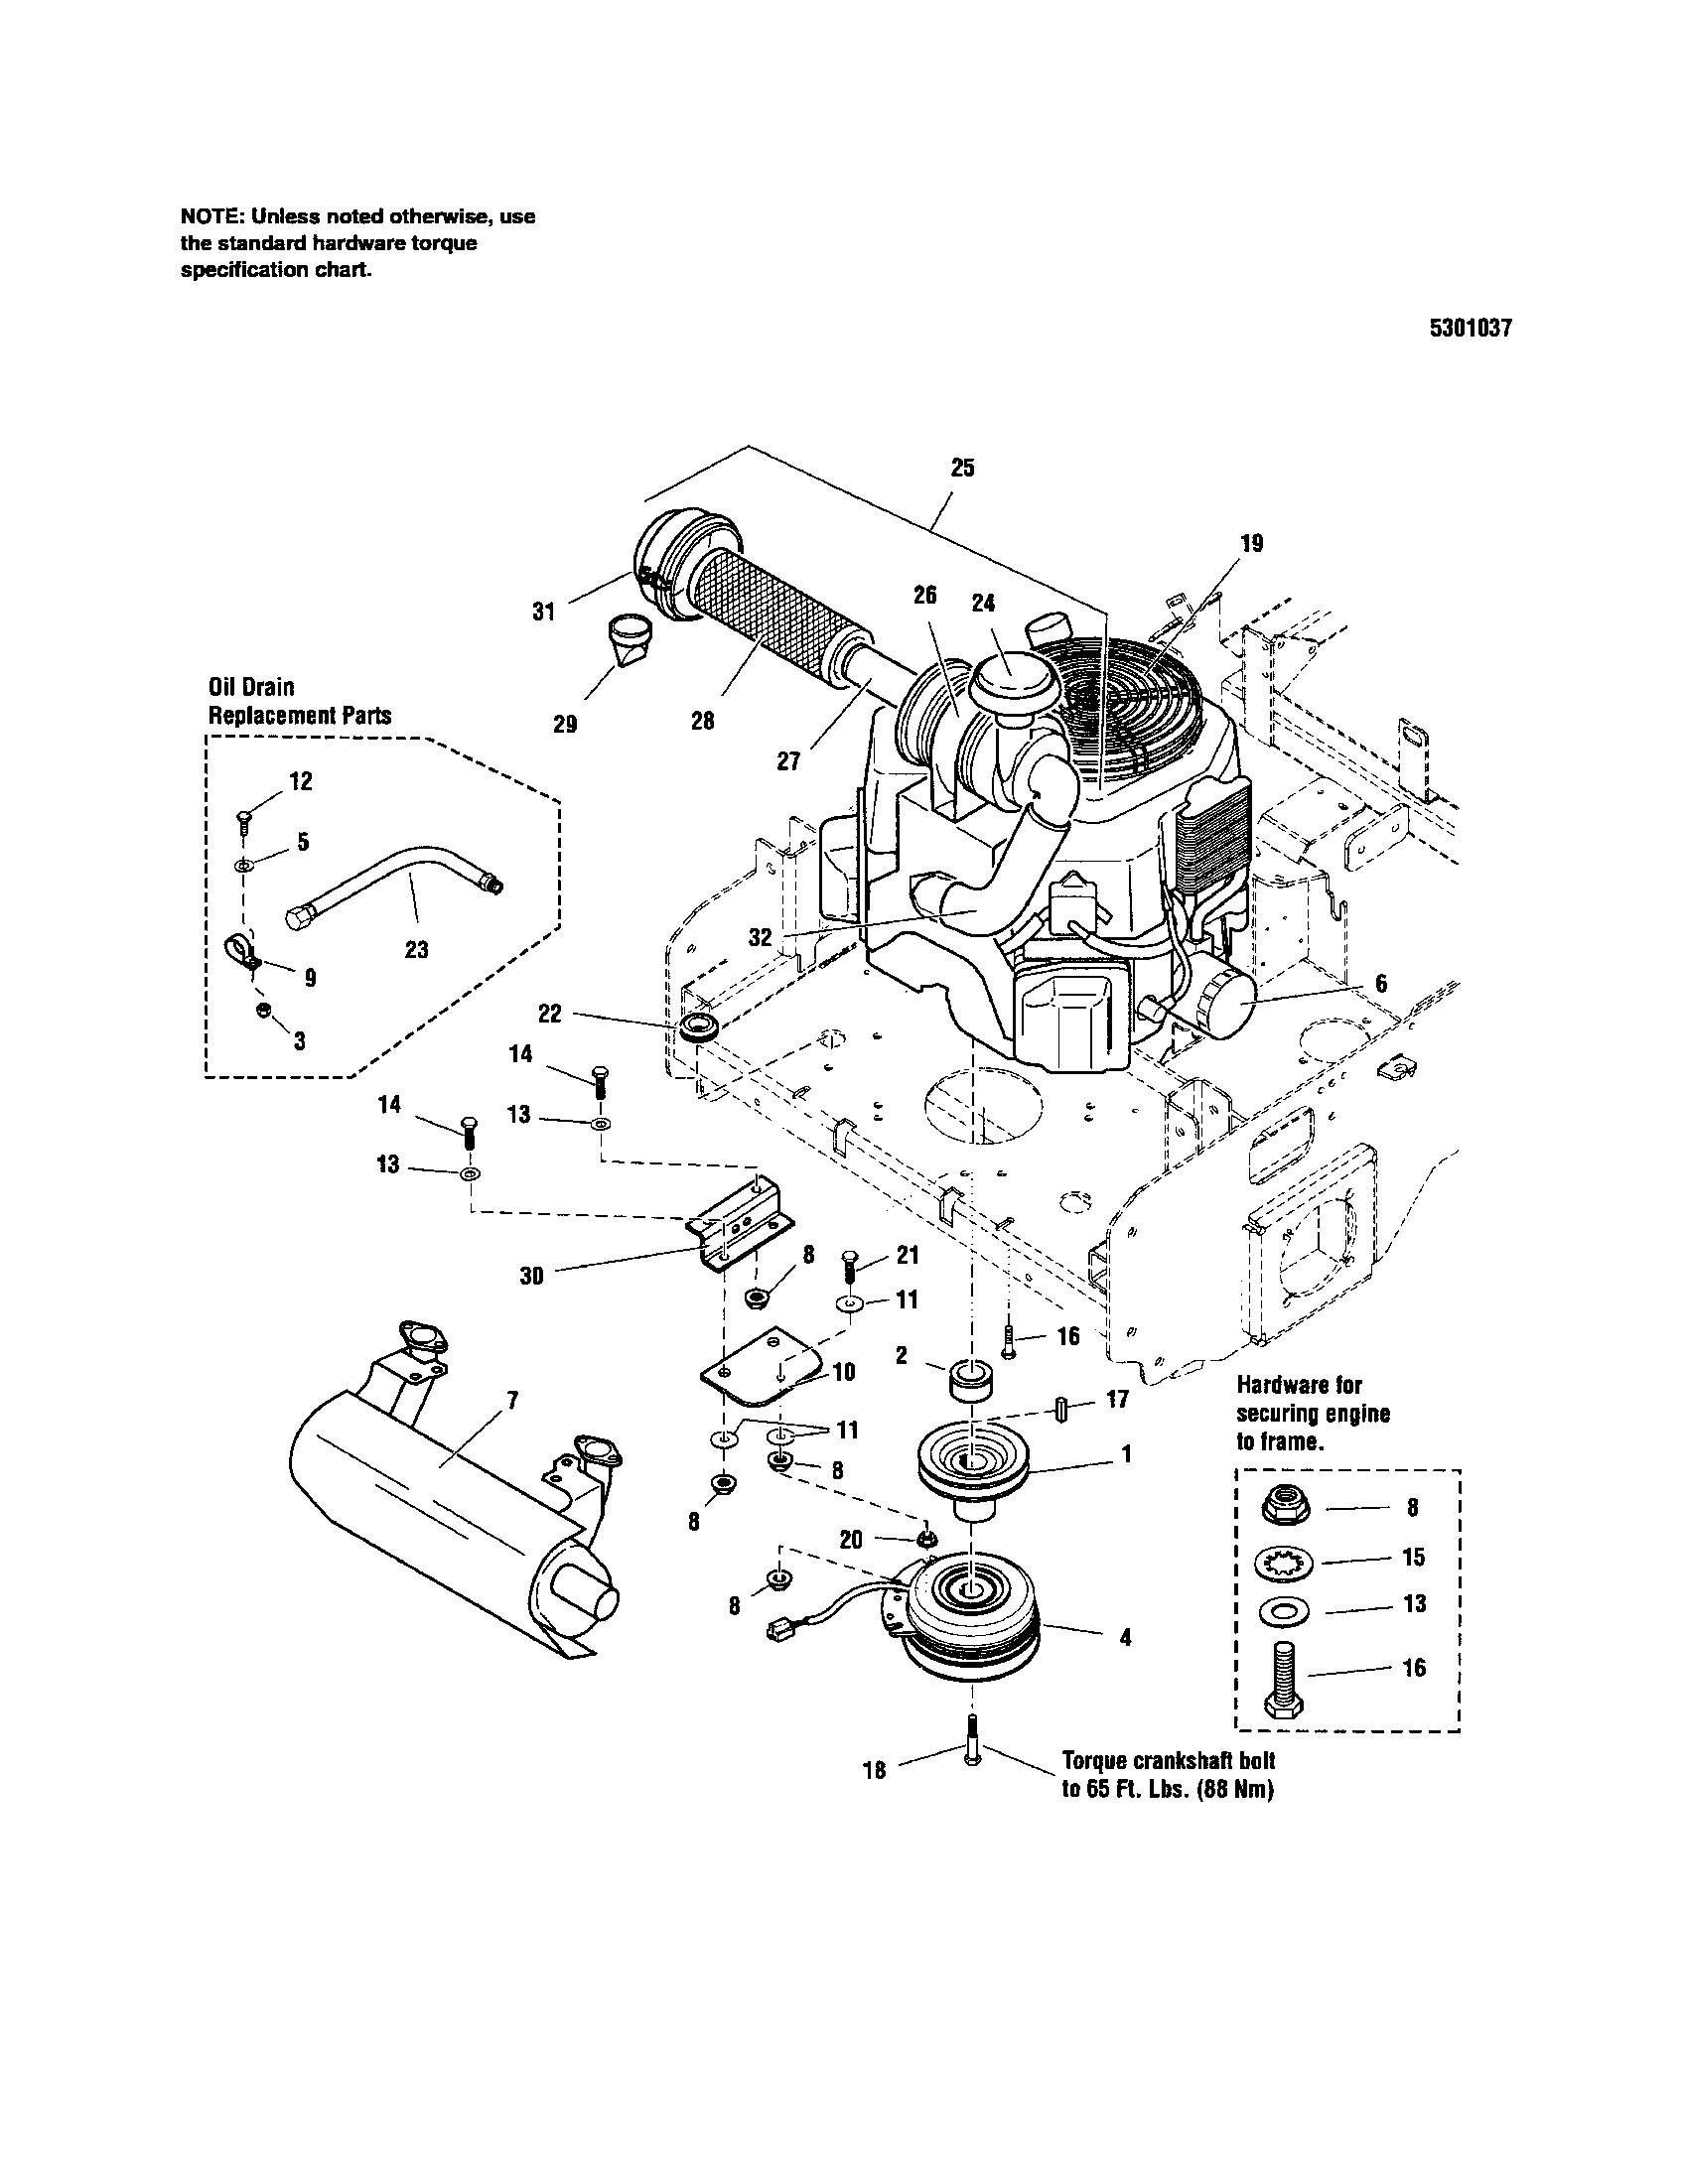 Marvelous Kohler Ch15 5 Wiring Diagram Wiring Library Wiring Digital Resources Aeocykbiperorg